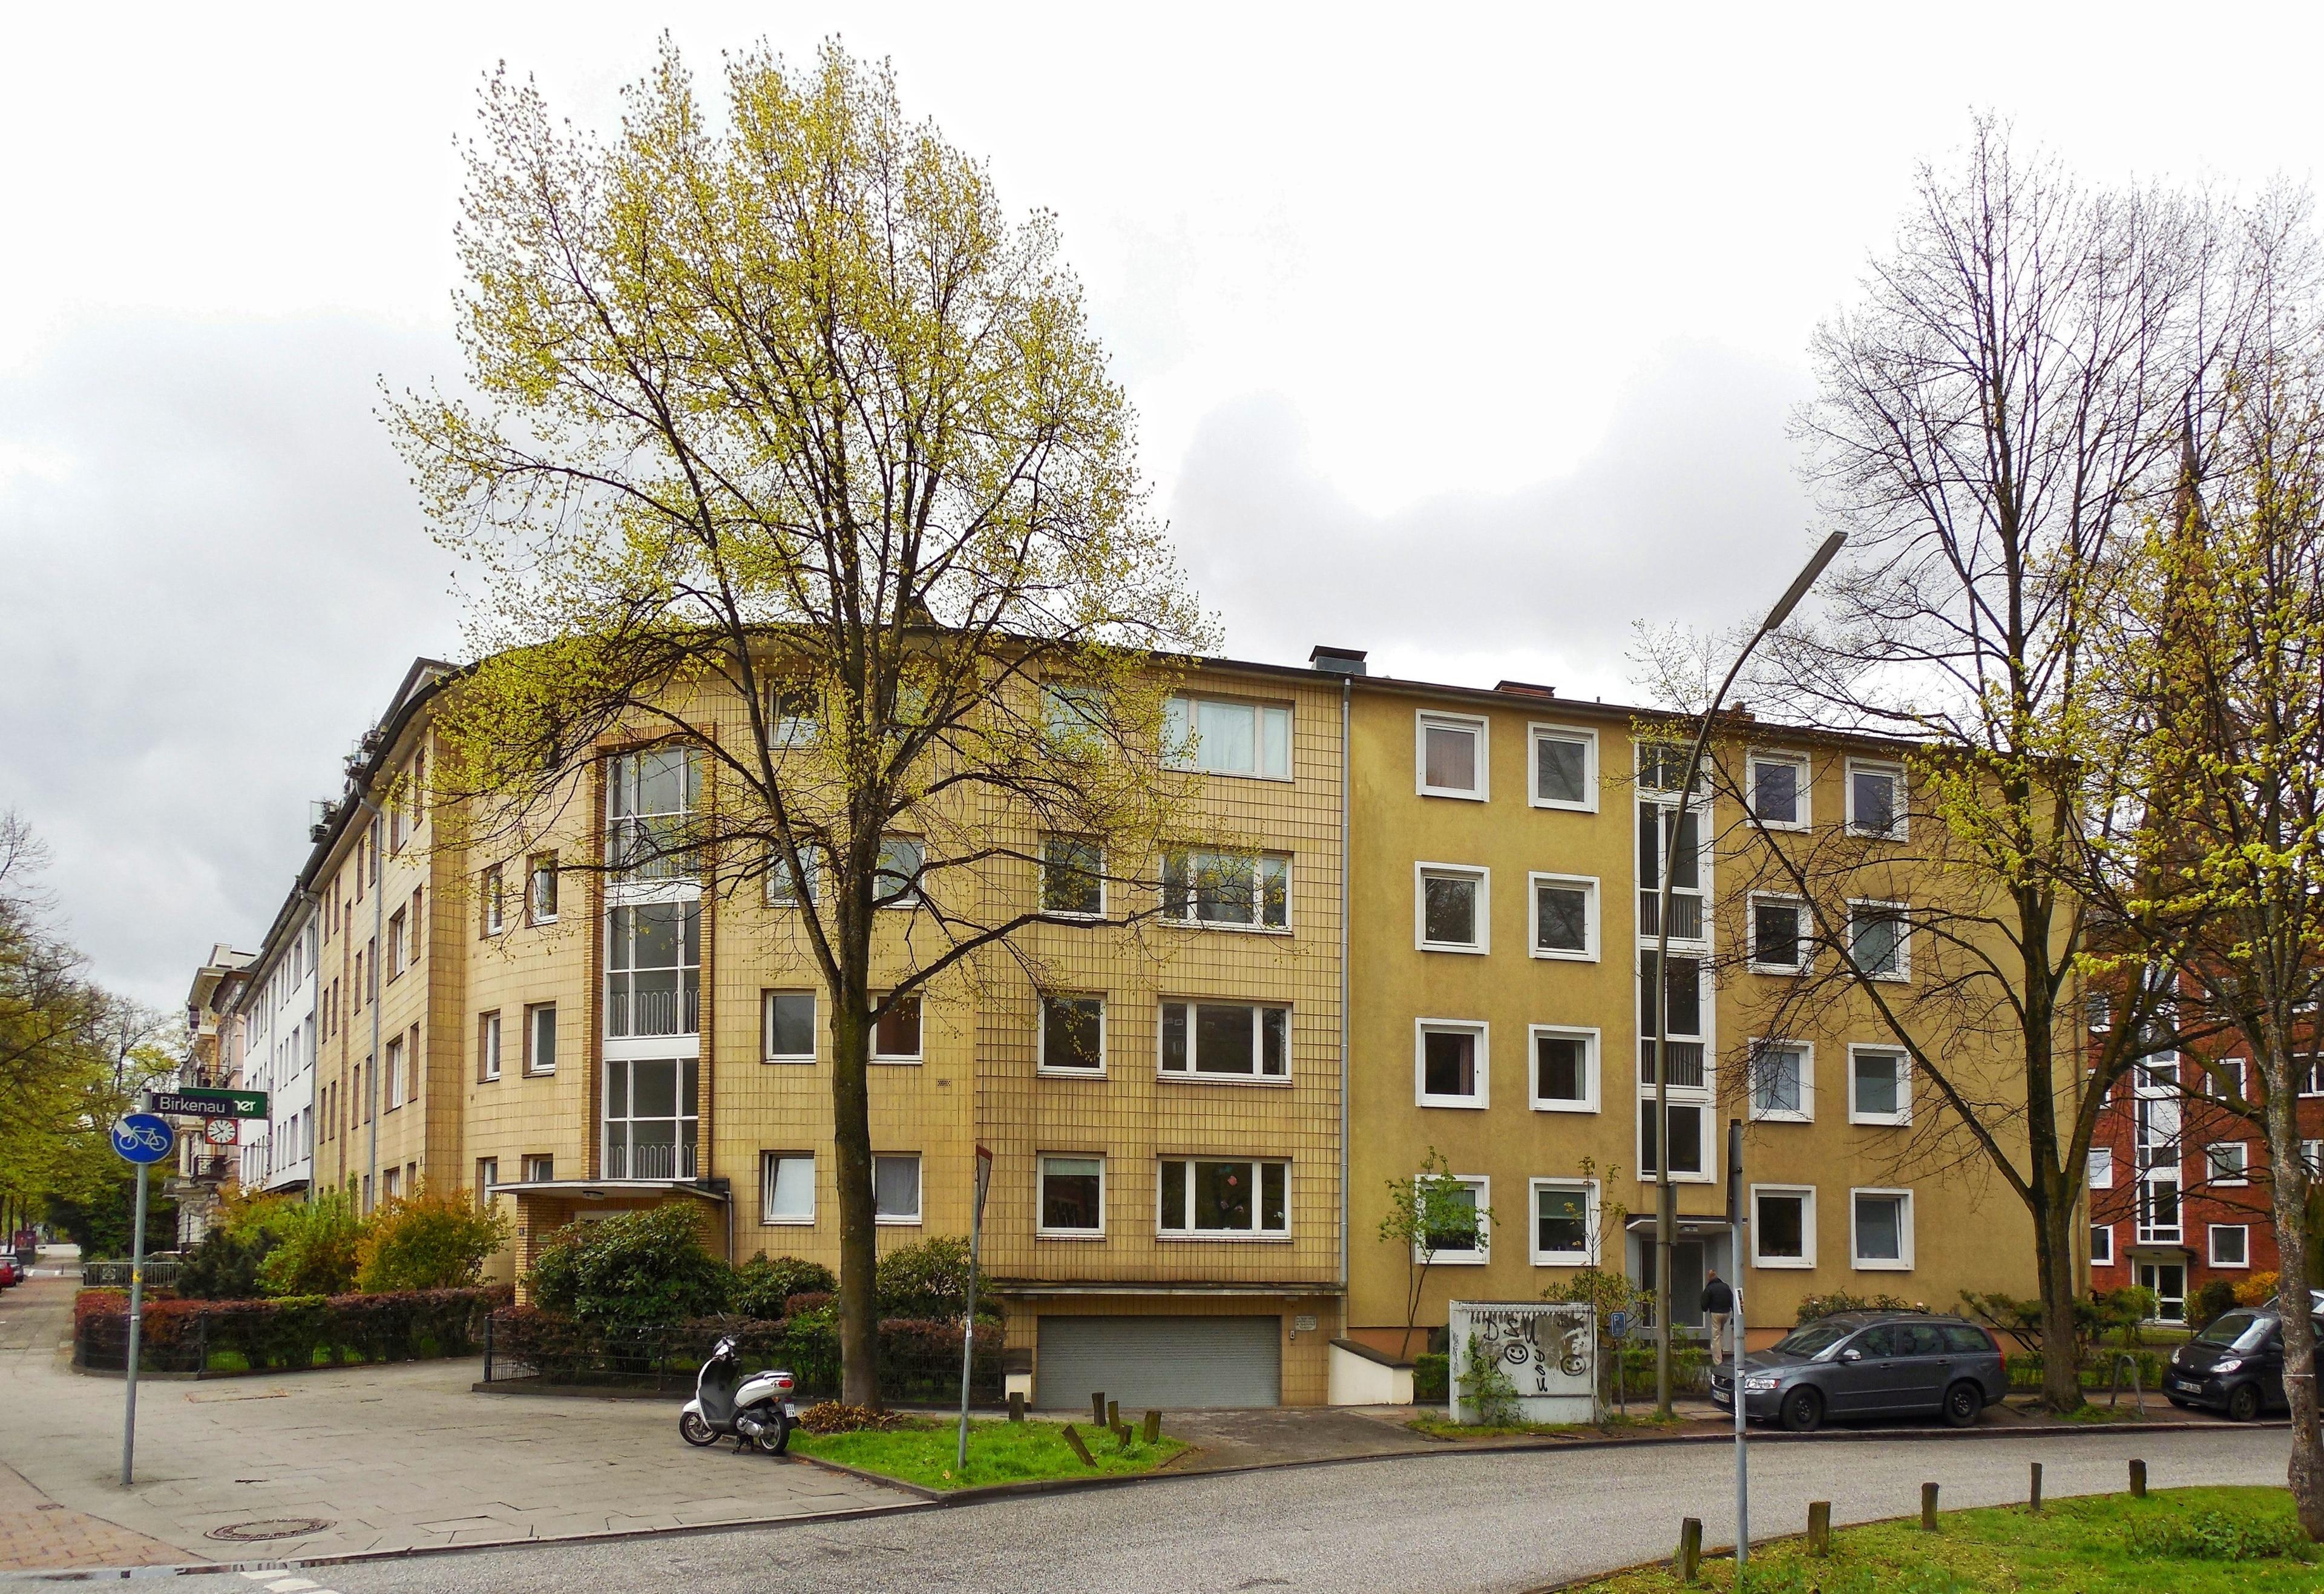 Uhlenhorst, Hamburg, Deutschland